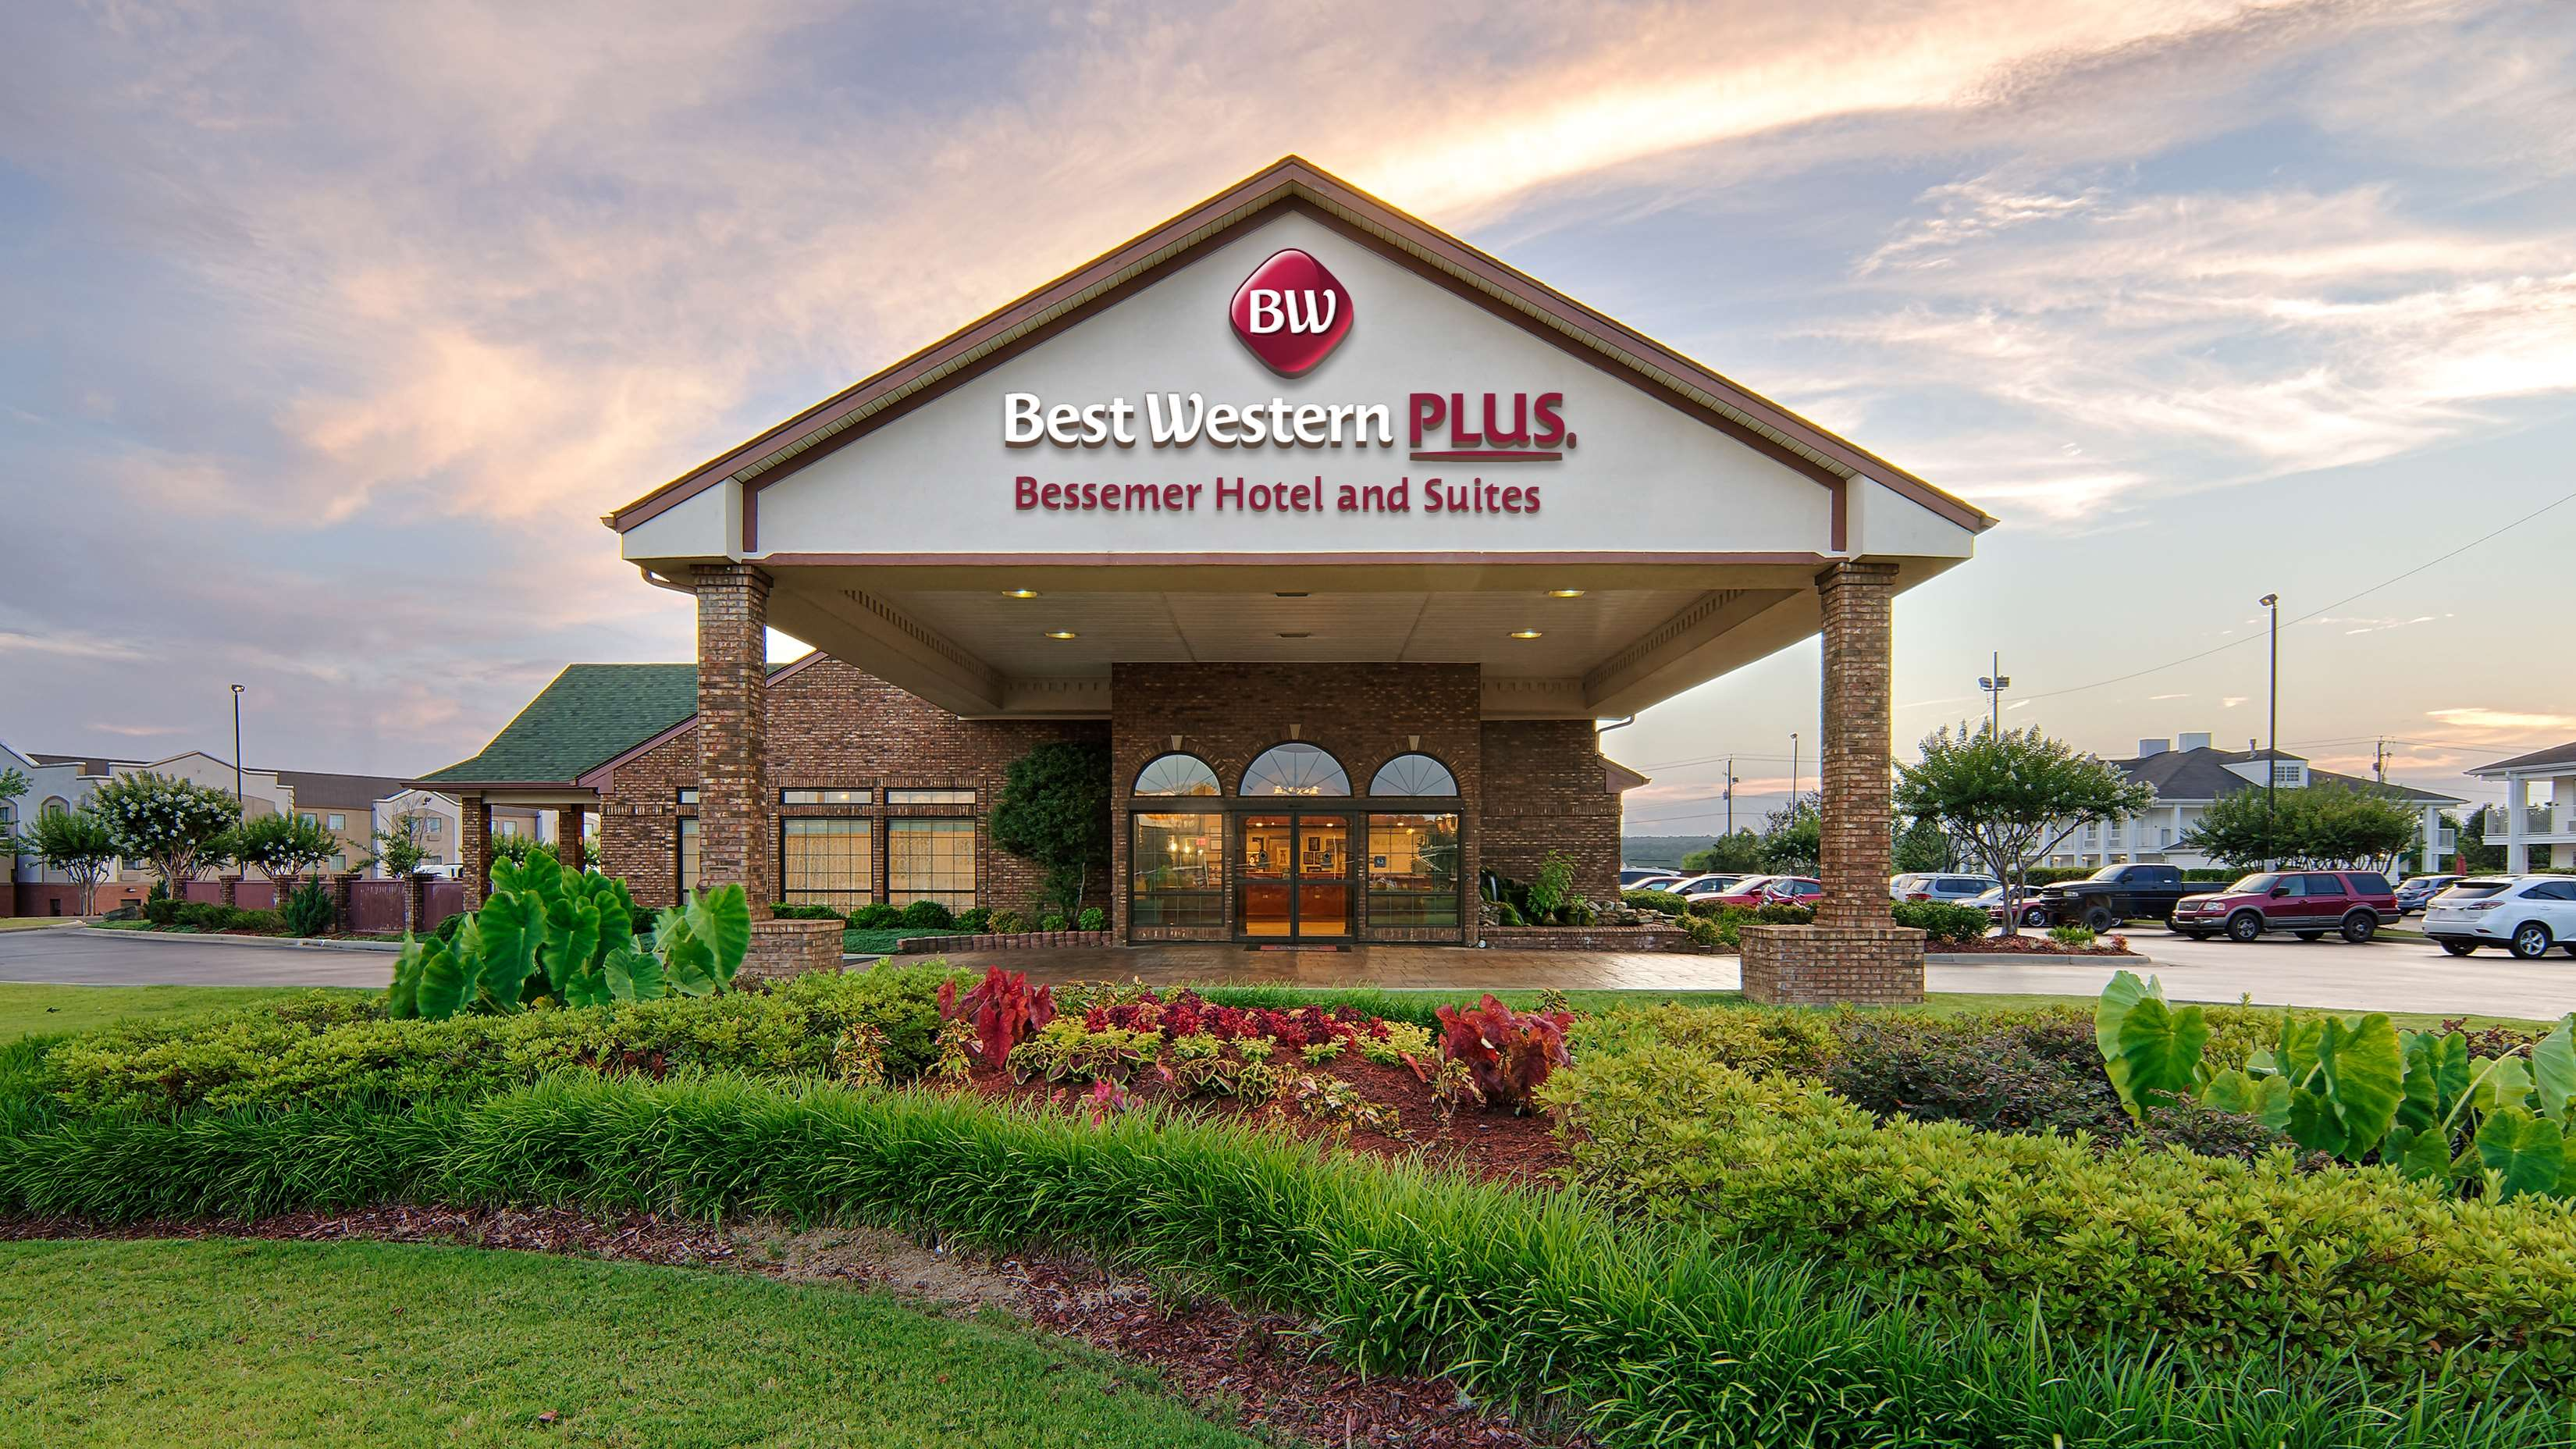 Best Western Plus Bessemer Hotel & Suites image 0